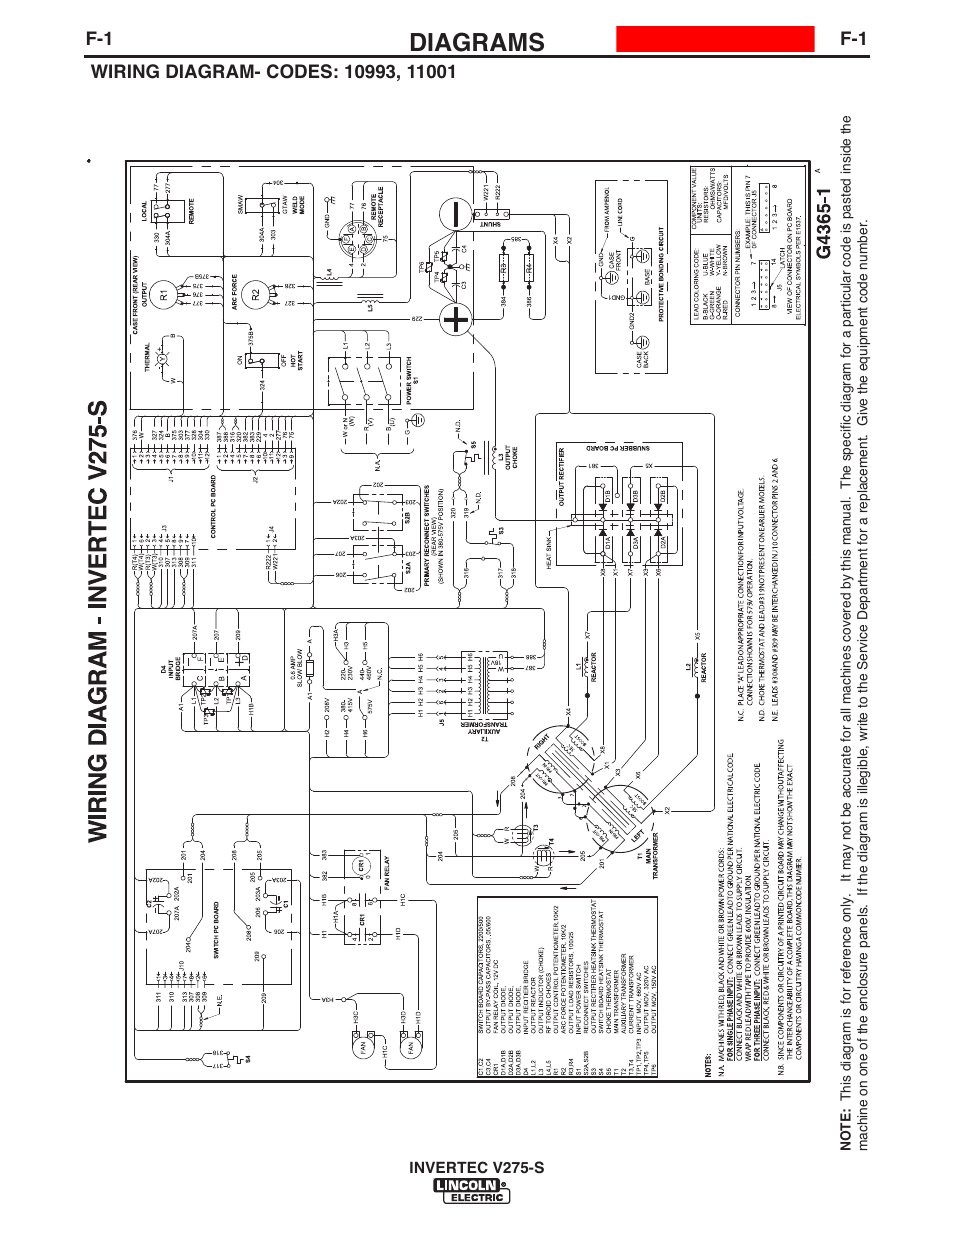 lincoln vantage 300 wiring diagram best wiring library Lincoln Electric Vantage 300 lincoln vantage 300 wiring diagram